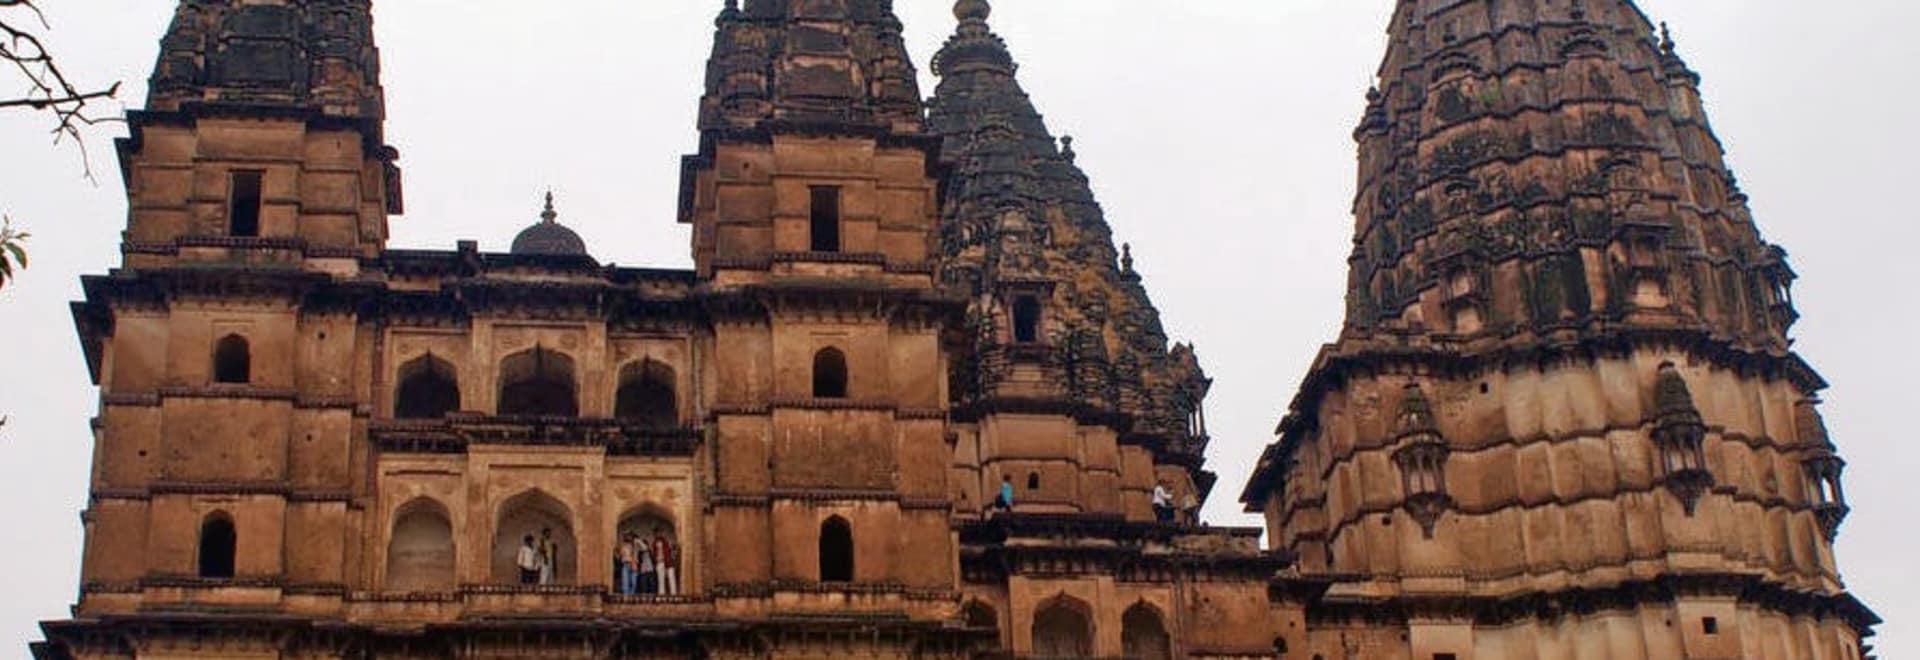 Chaturbhuj-temple_haryana.jpg